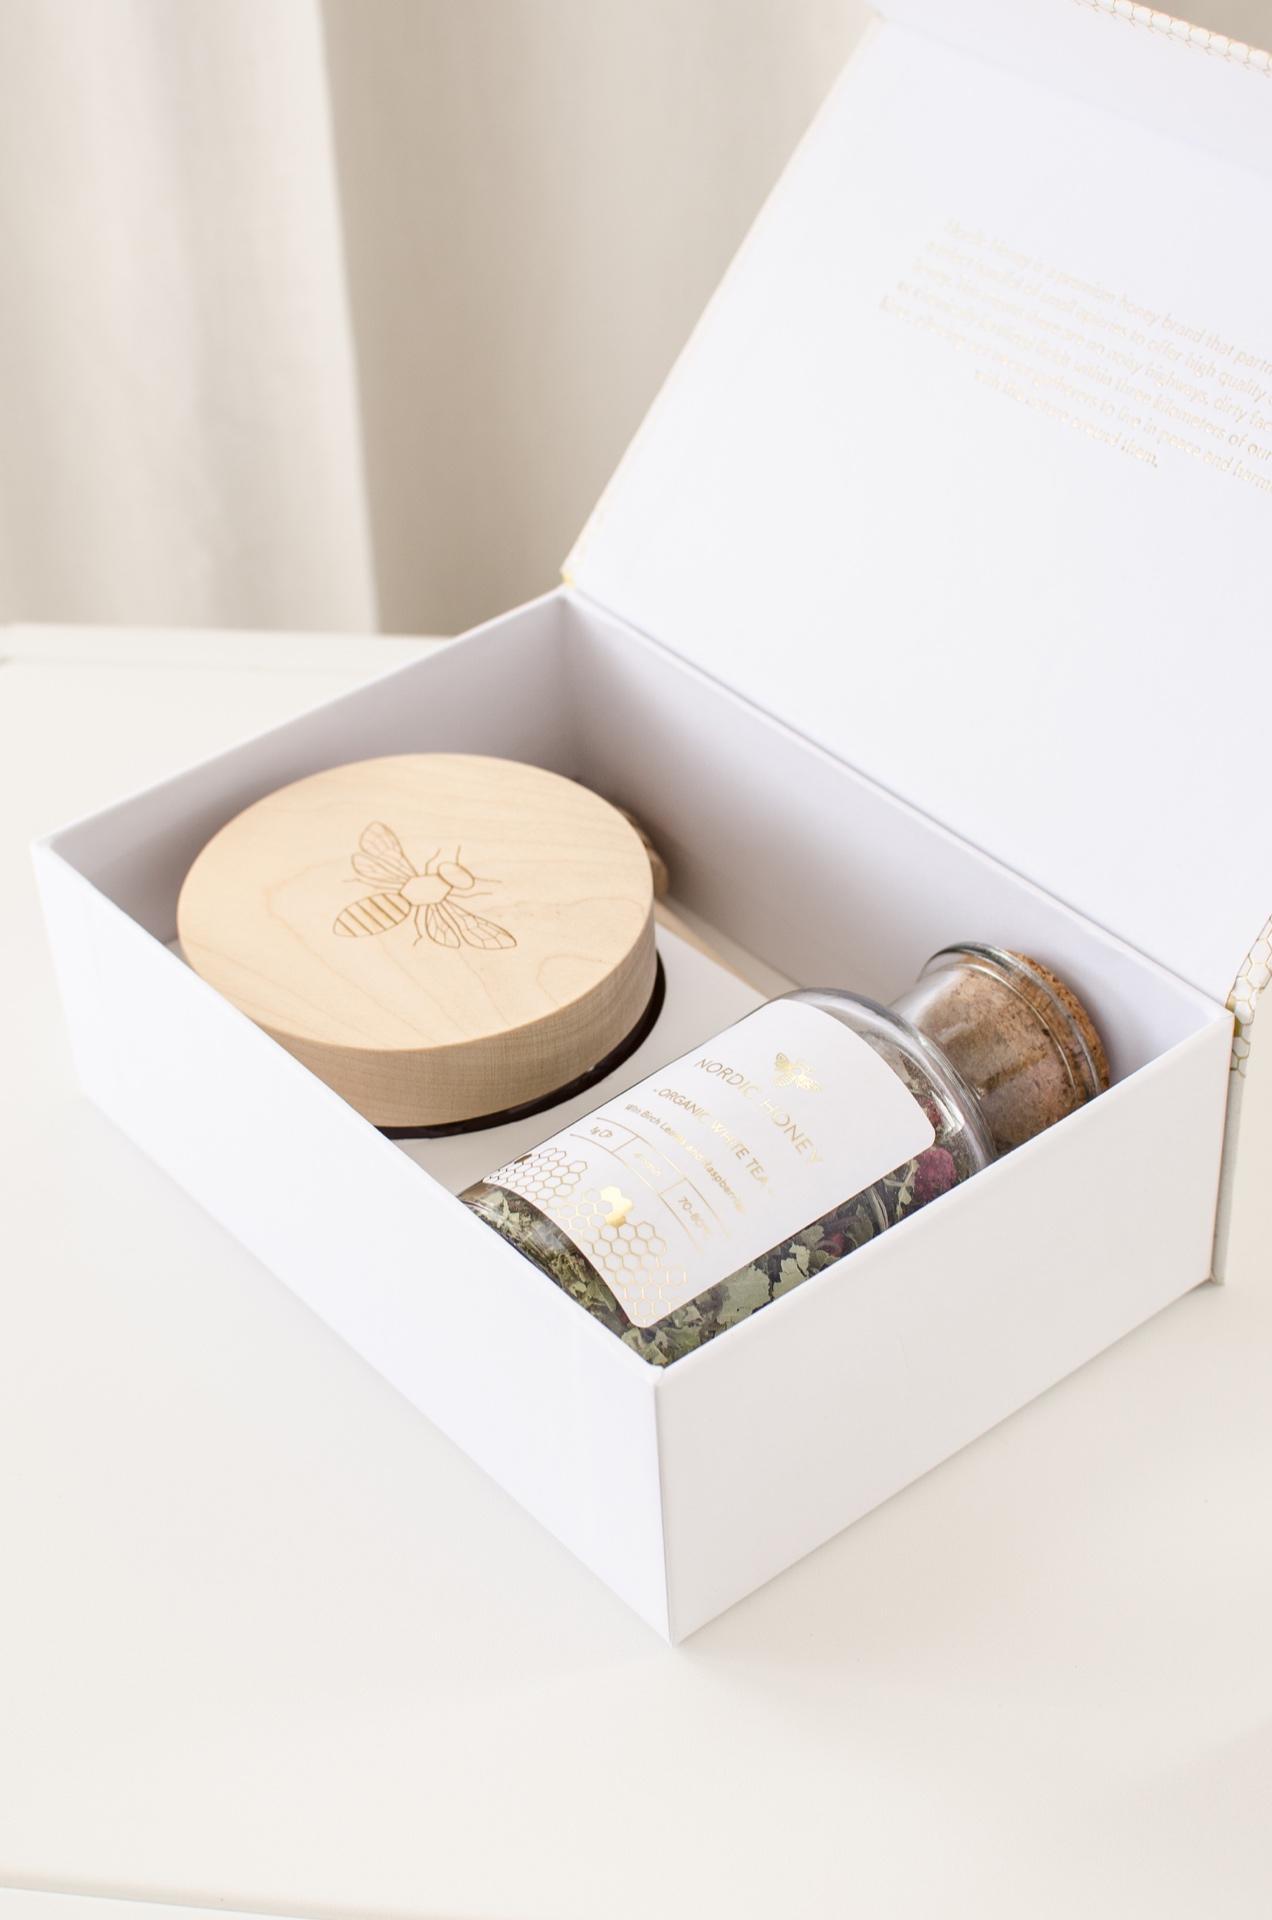 Nordic Honey_Honey & Tea Gift Set_Tealicious_2.jpg